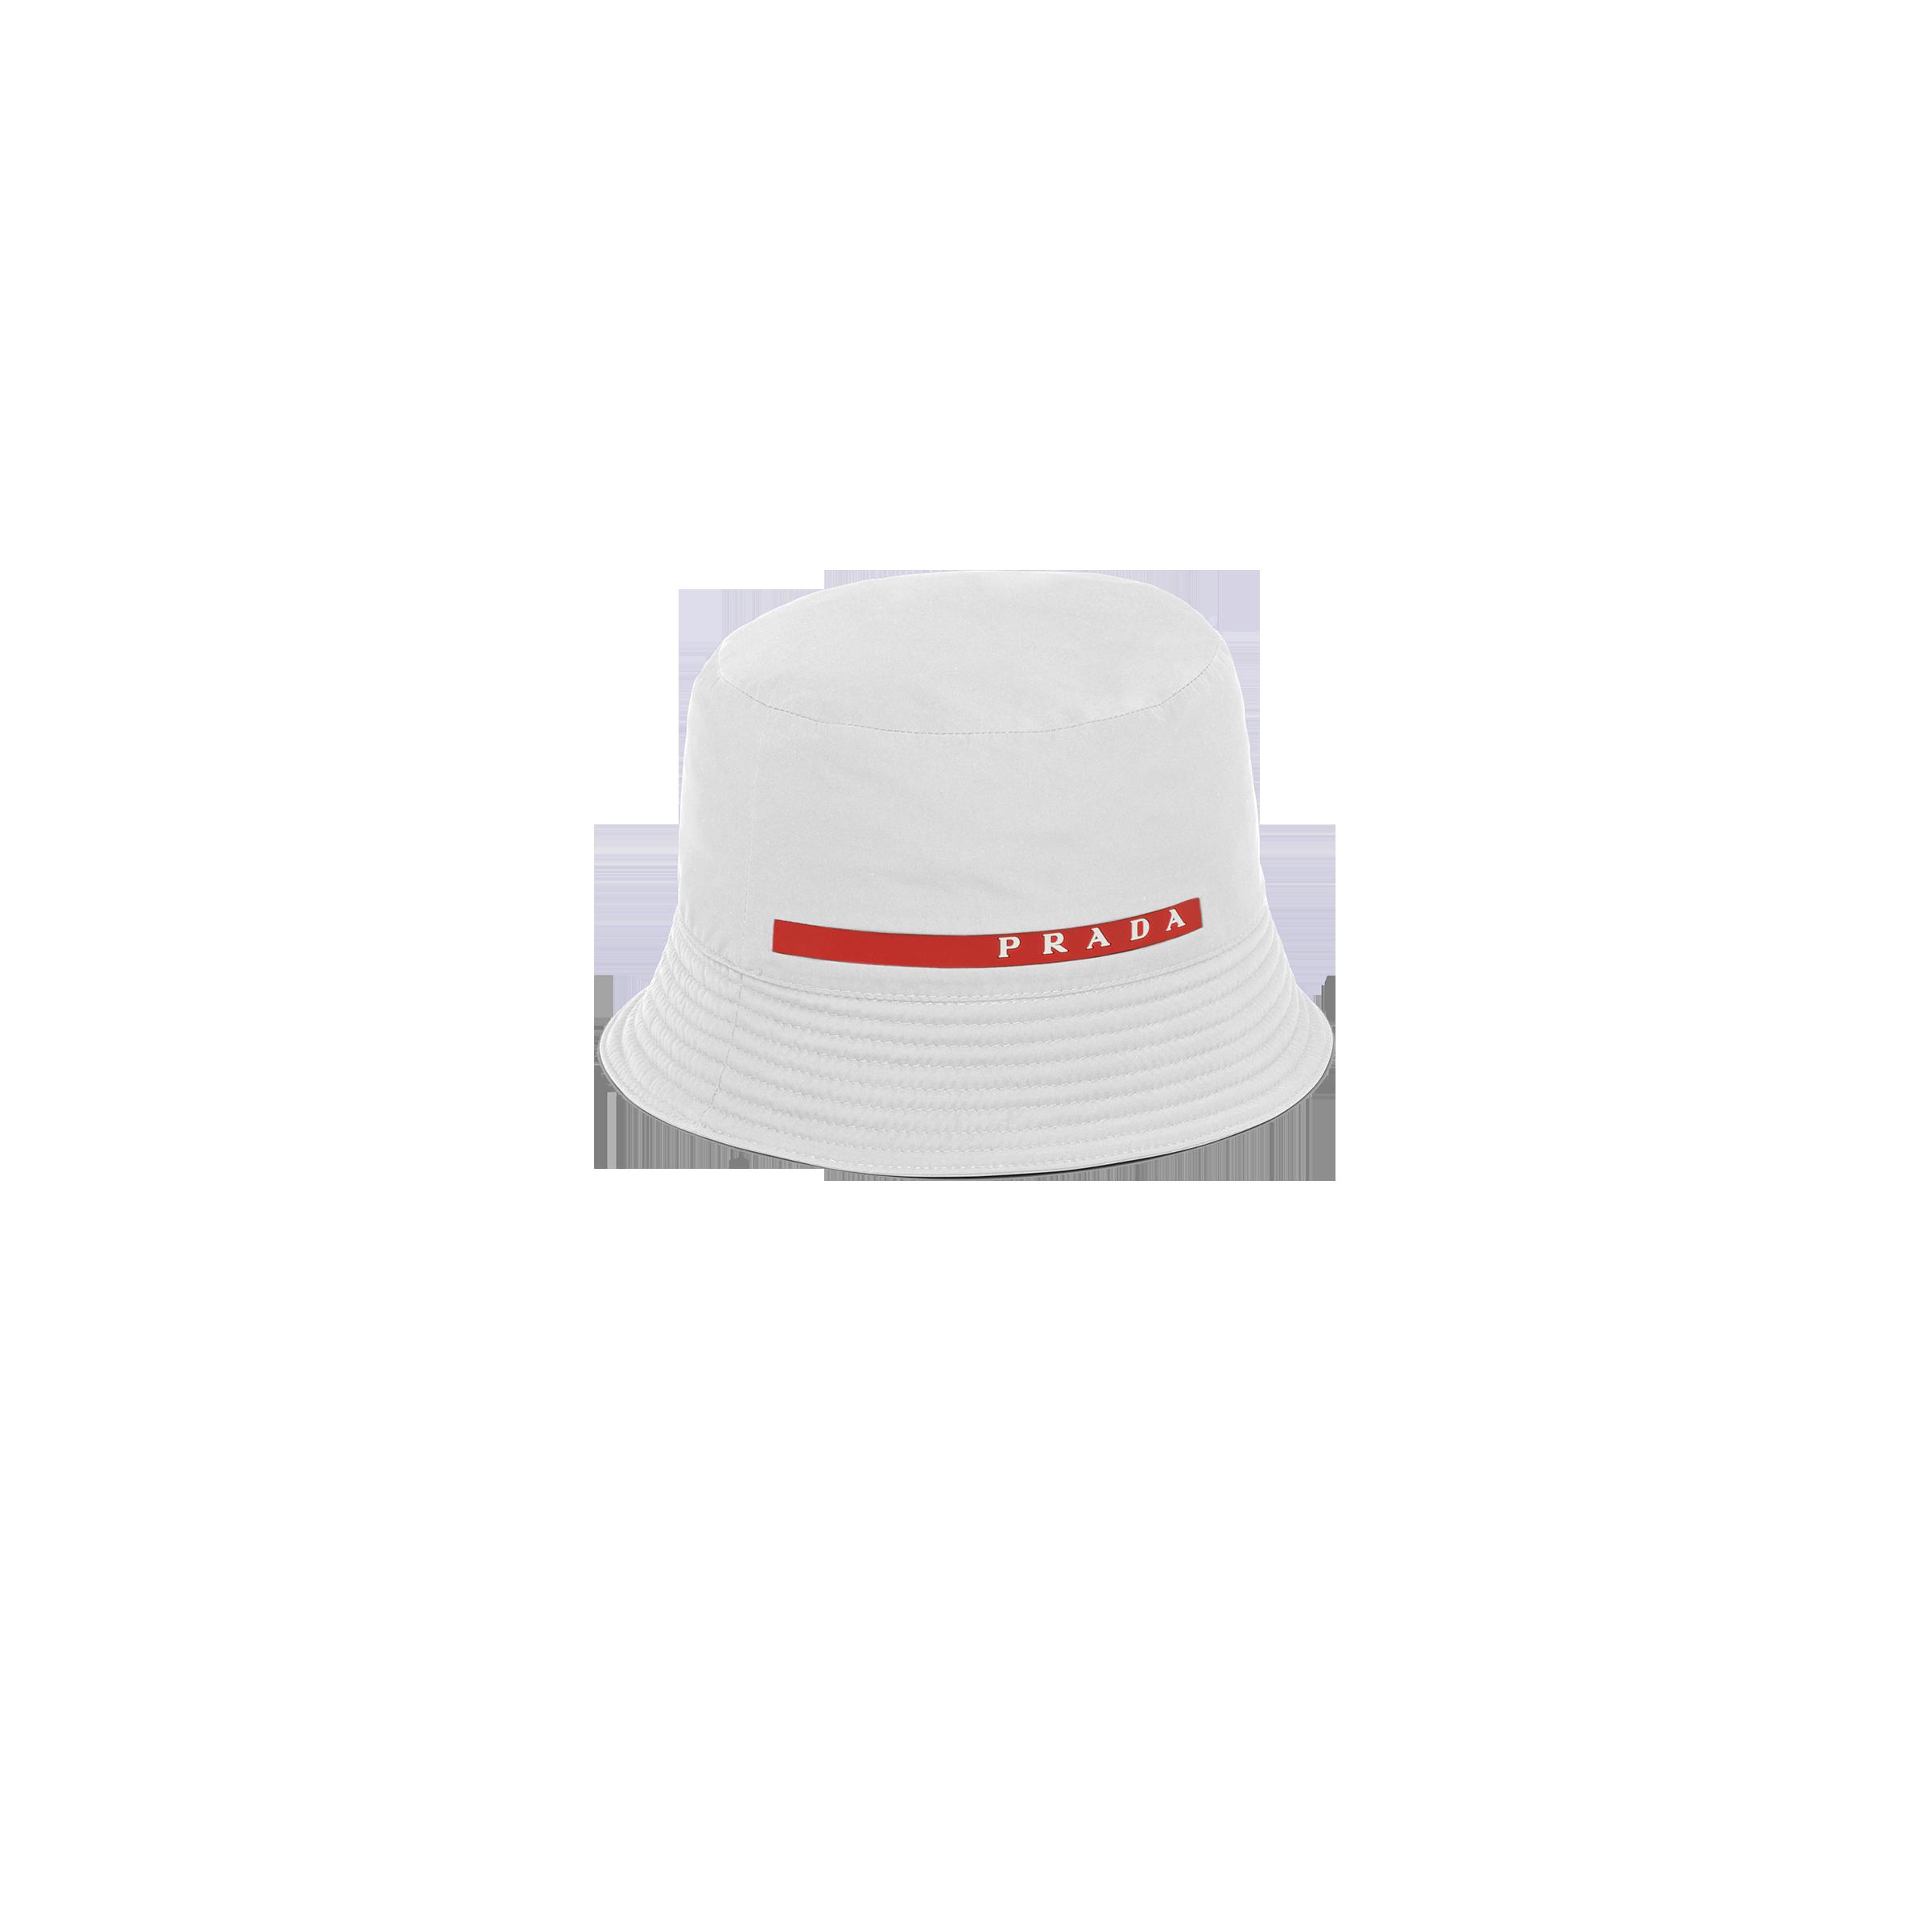 P*R*A*D*A Bucket Hat